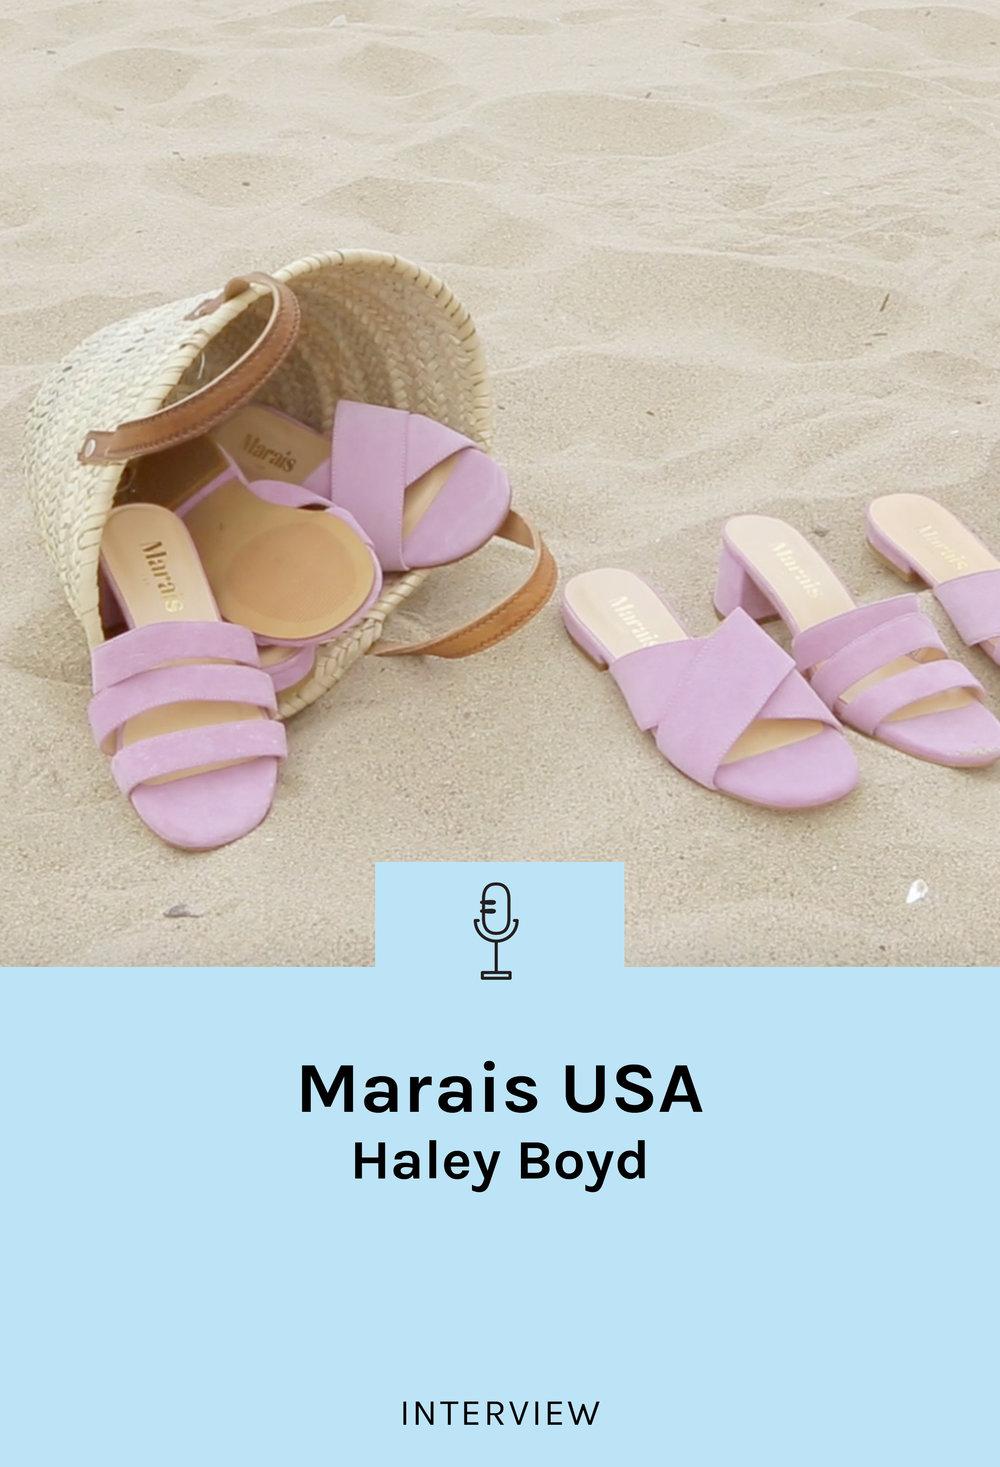 lisa-says-gah-interview-haley-boyd-marais-usa